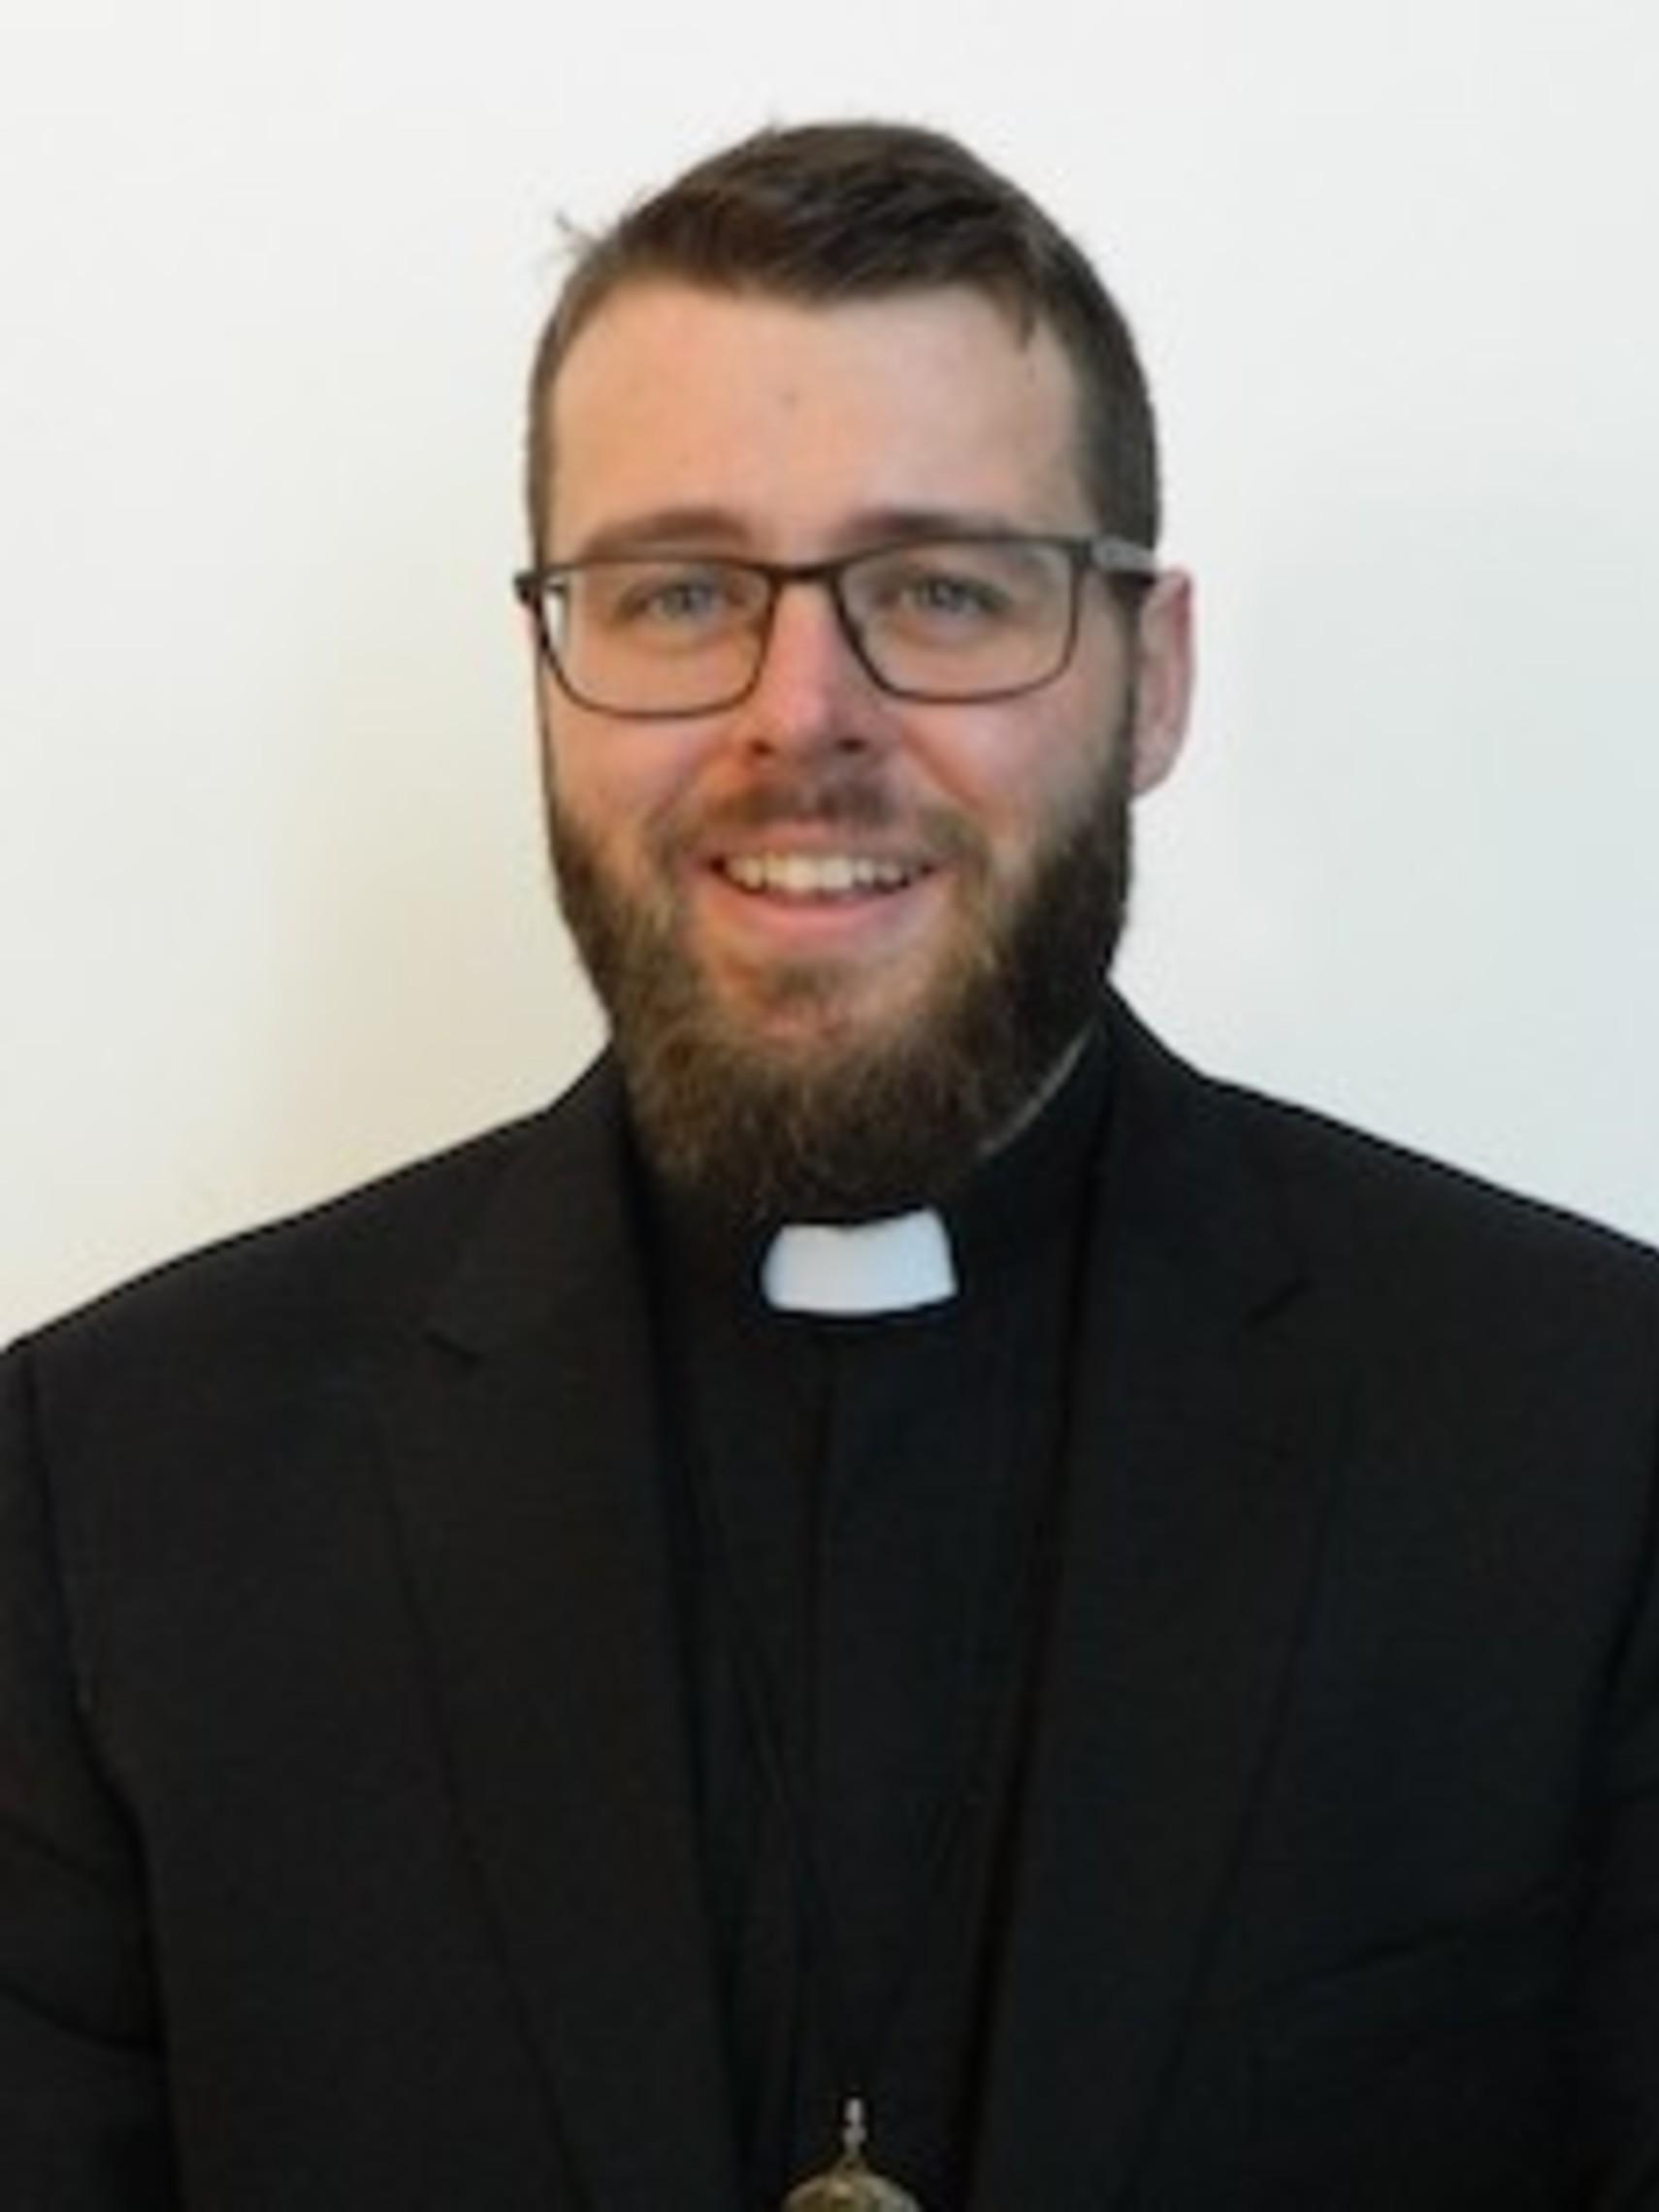 Br. John Castonguay